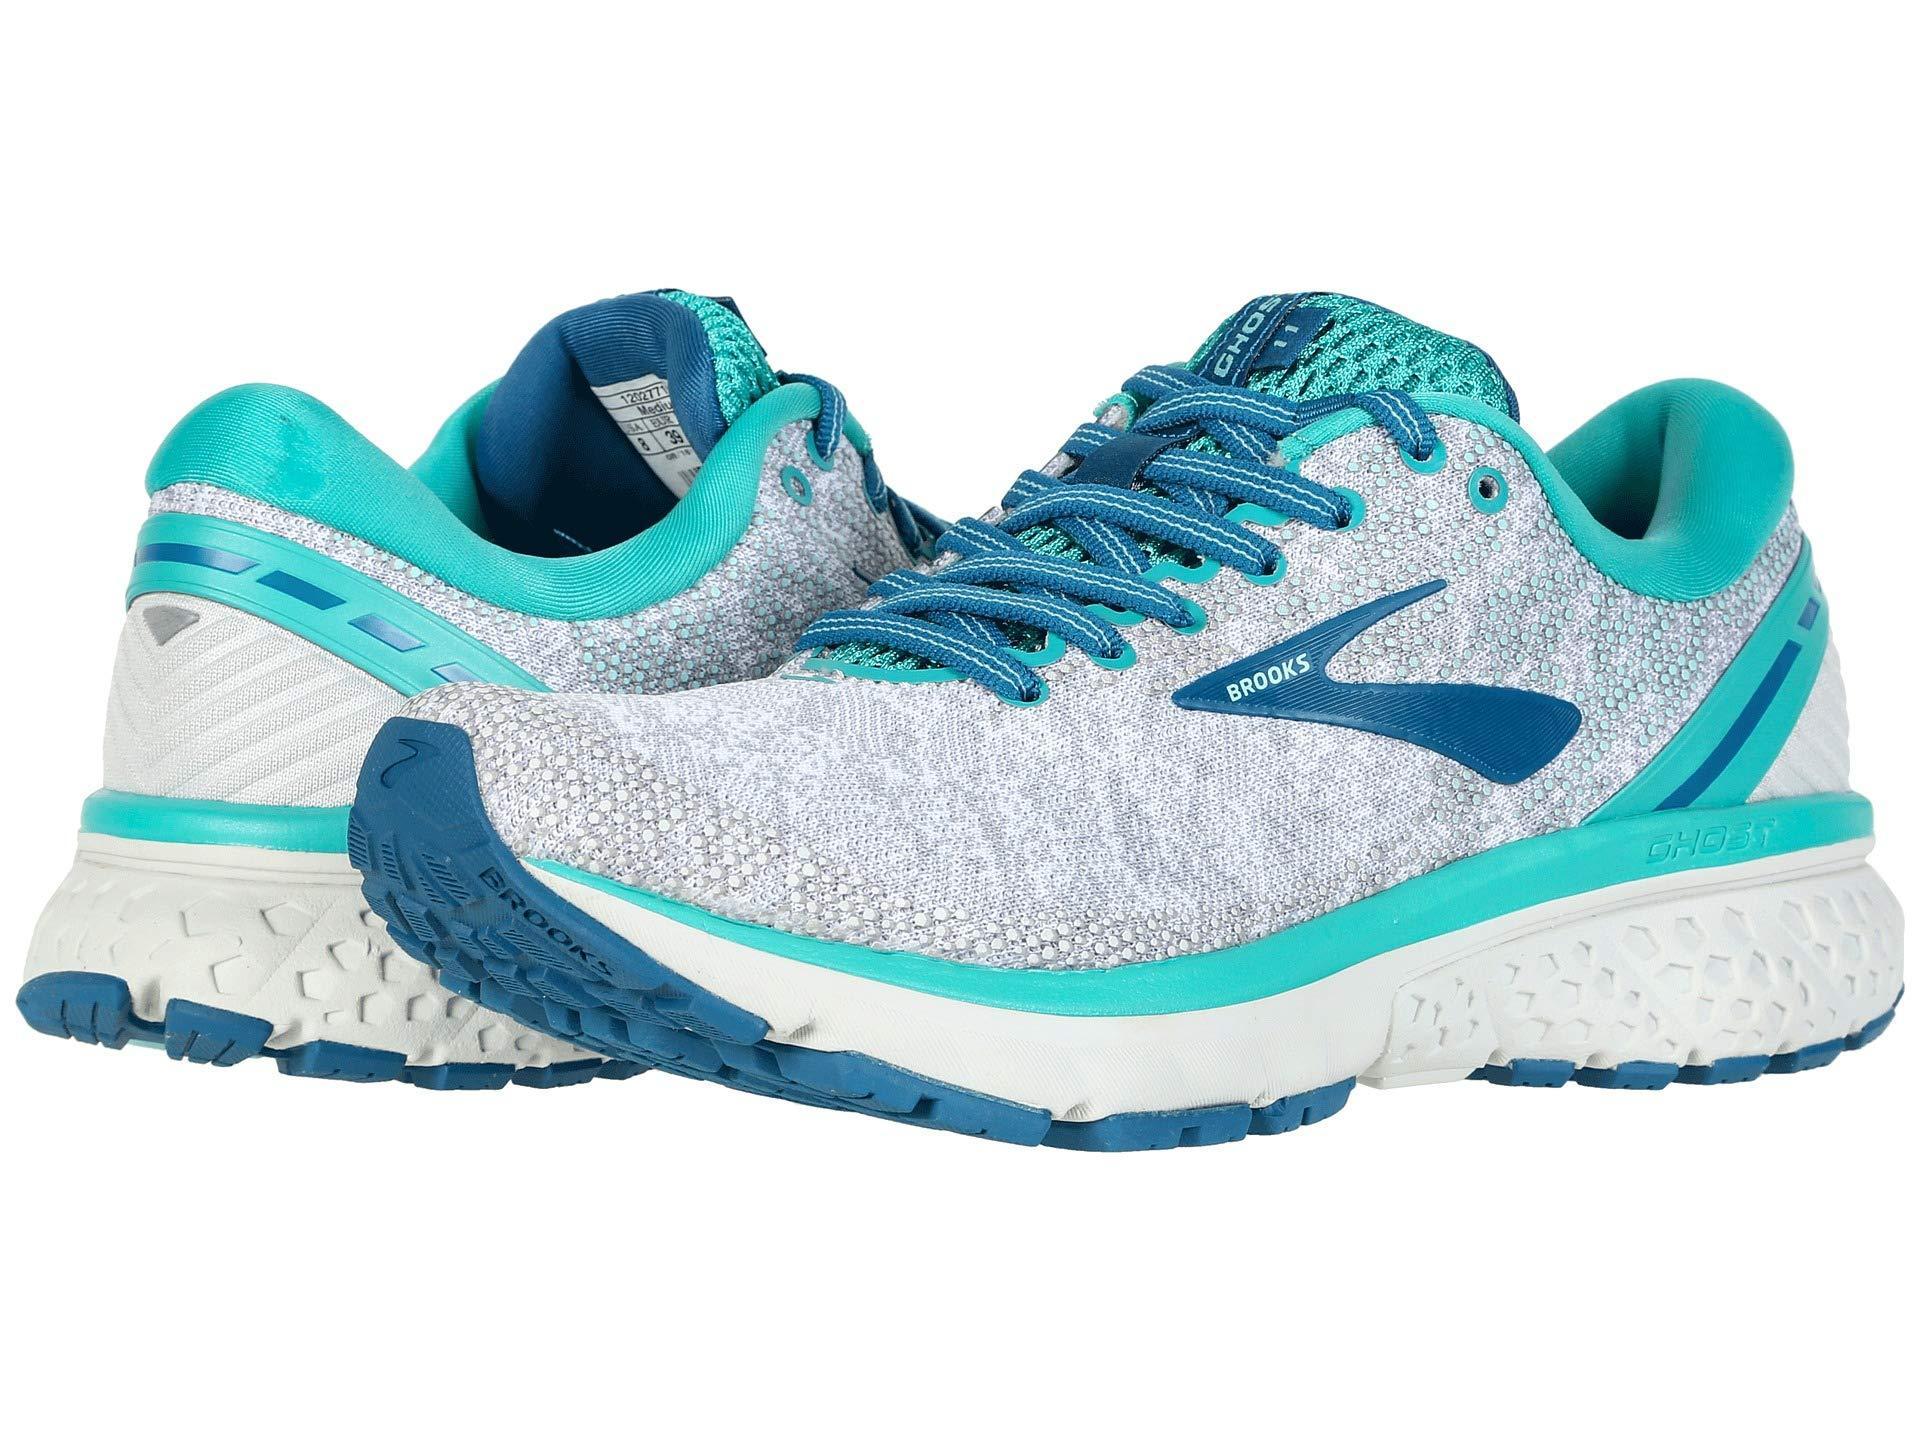 bc9330e1d69 Brooks - Blue Ghost 11 (ebony oyster wild Aster) Women s Running Shoes.  View fullscreen